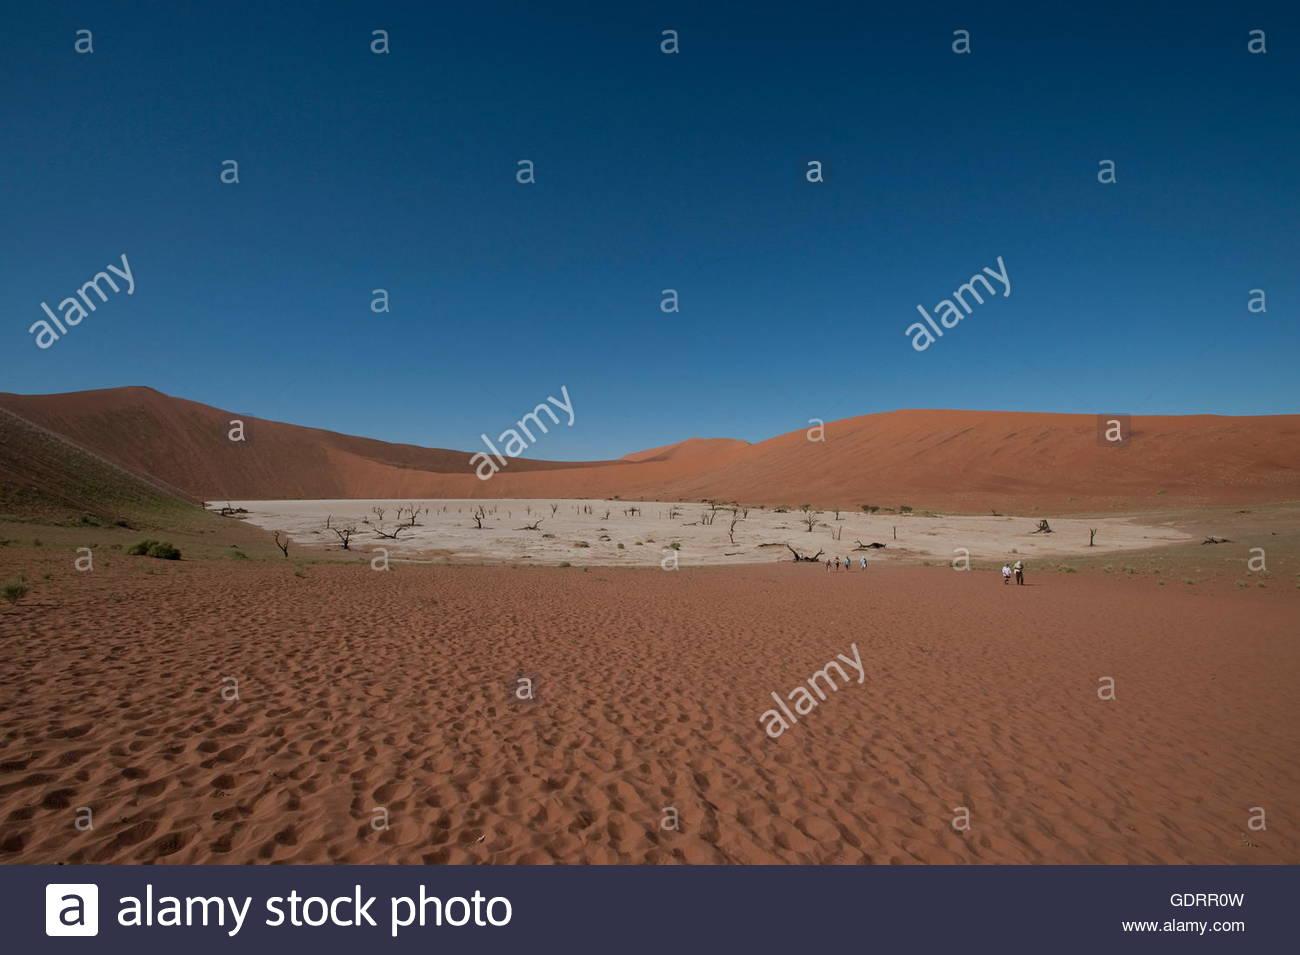 geography / travel, Namibia, Dead Vlei at Sossusvlei in Naukluft Park Namib desert Namibia - Stock Image